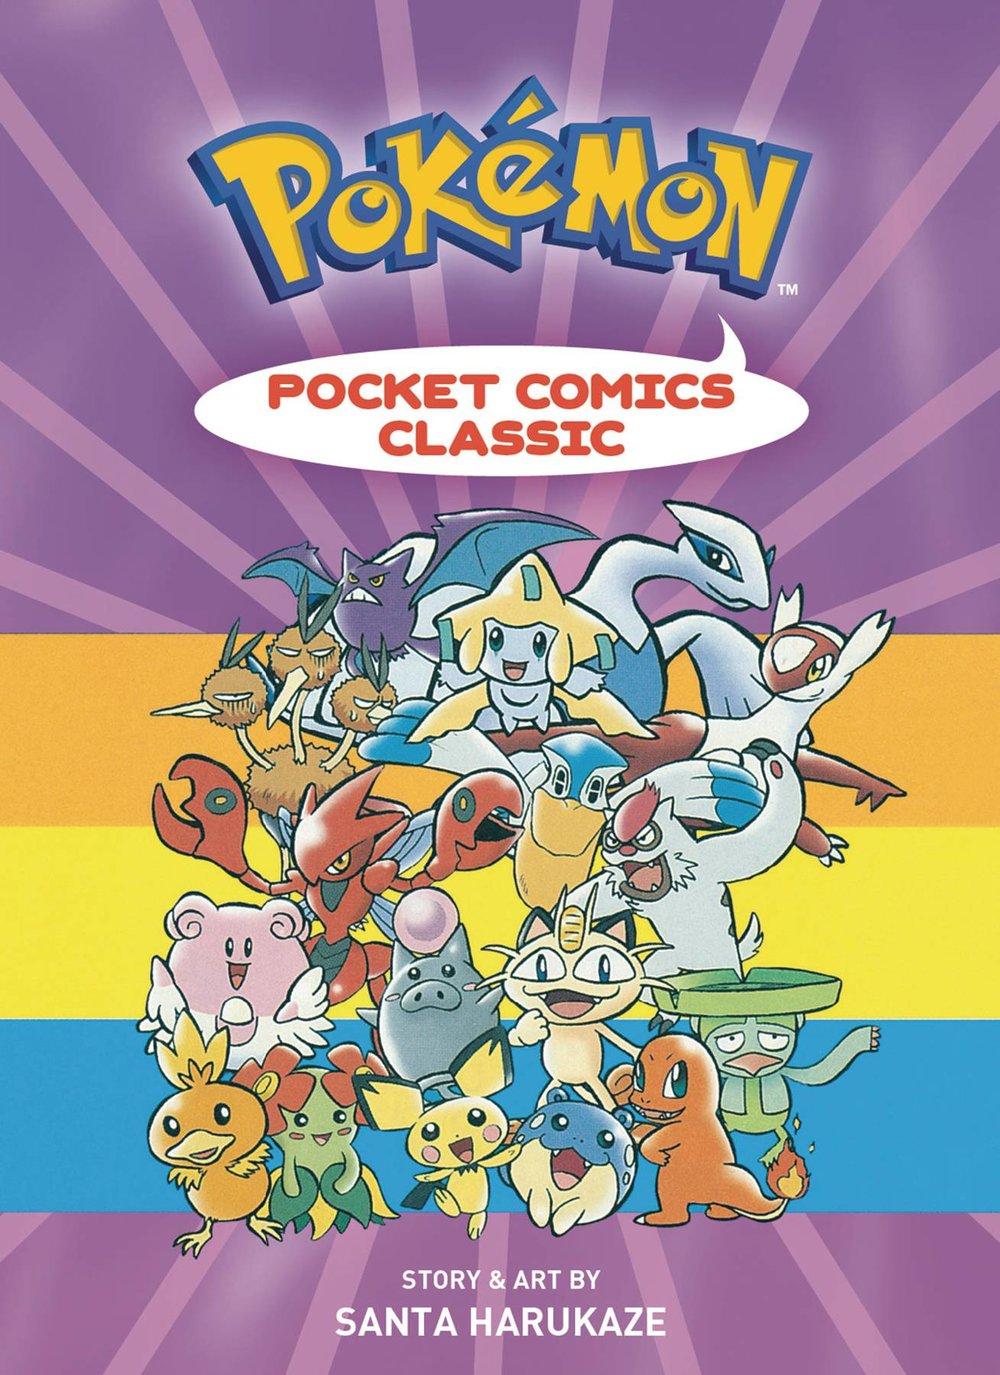 POKEMON POCKET COMICS CLASSIC GN